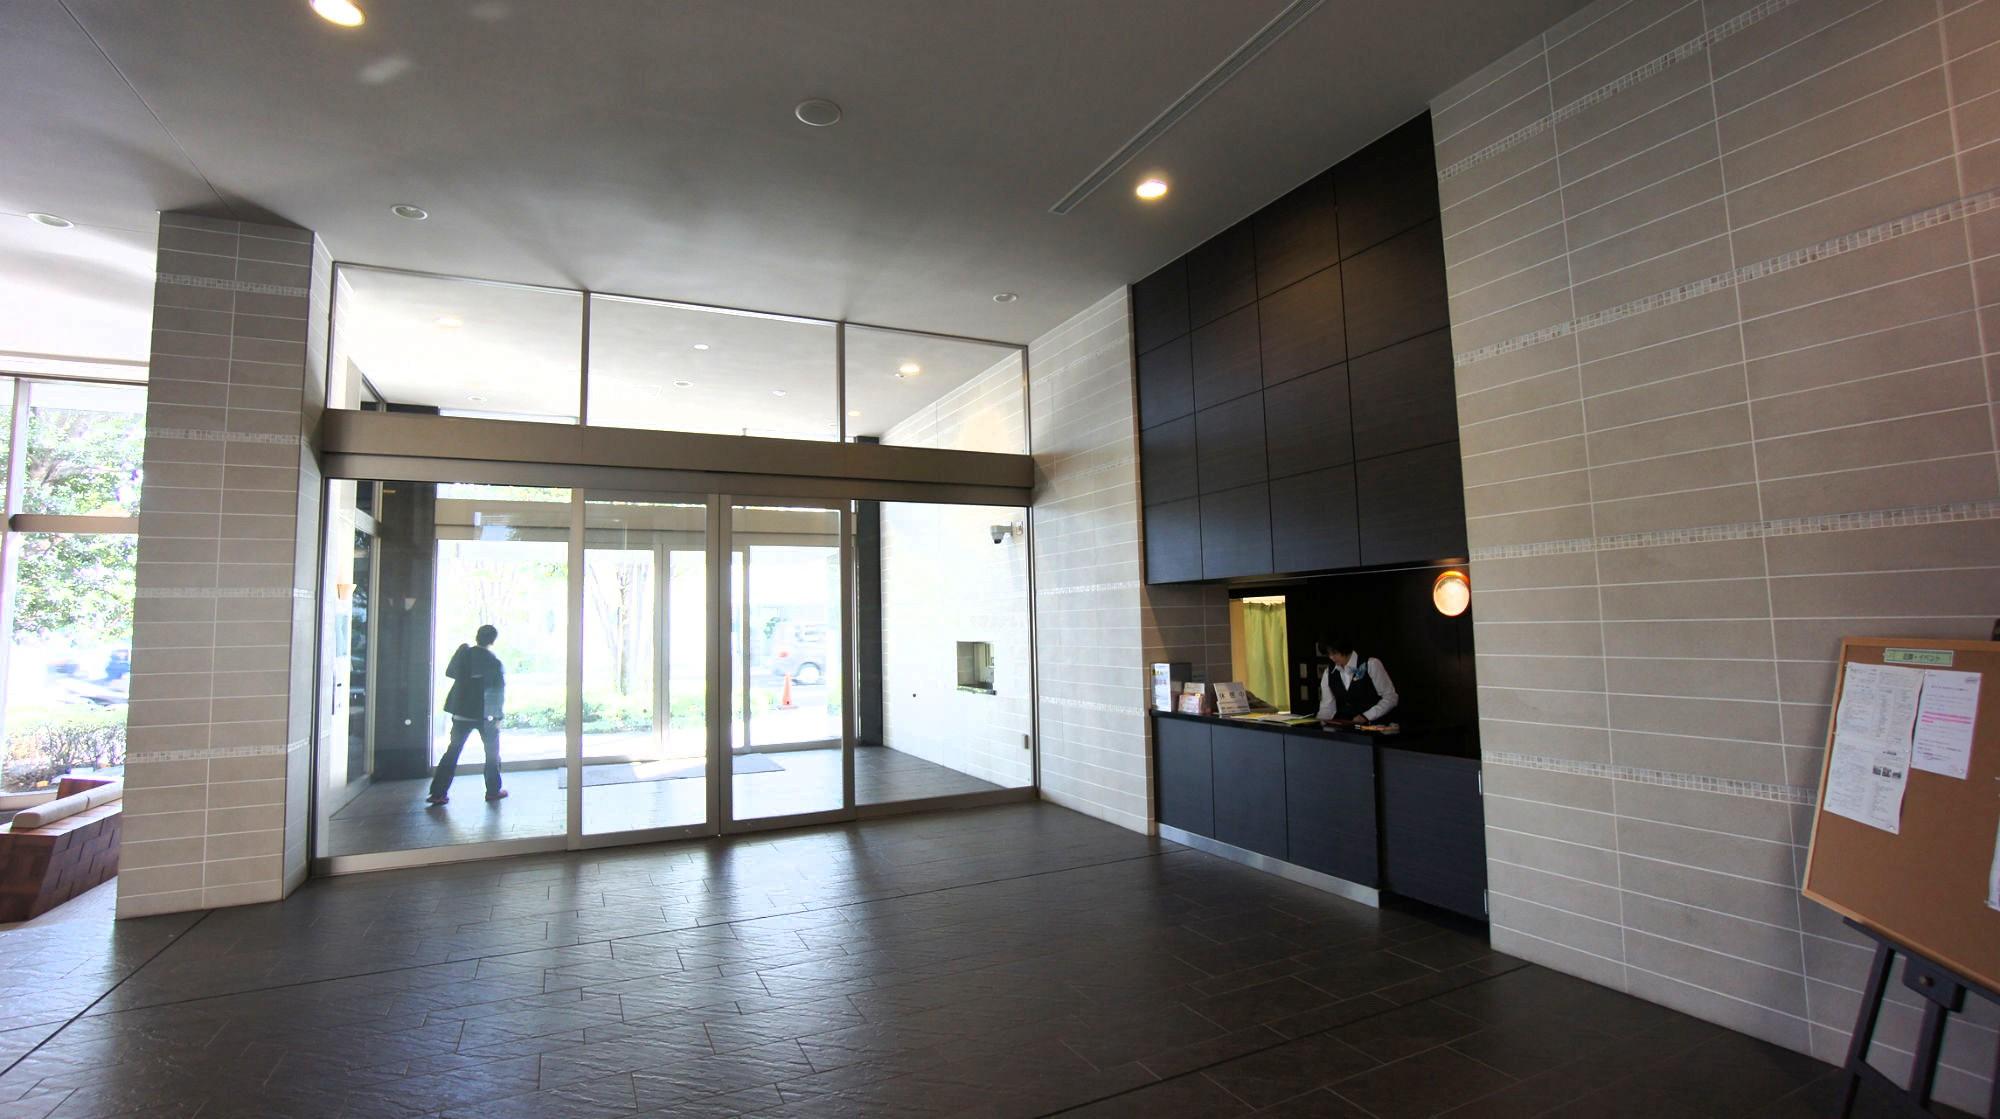 img 5a2d3d495ccf8.png - 芸能人が住んでいるマンションの特徴